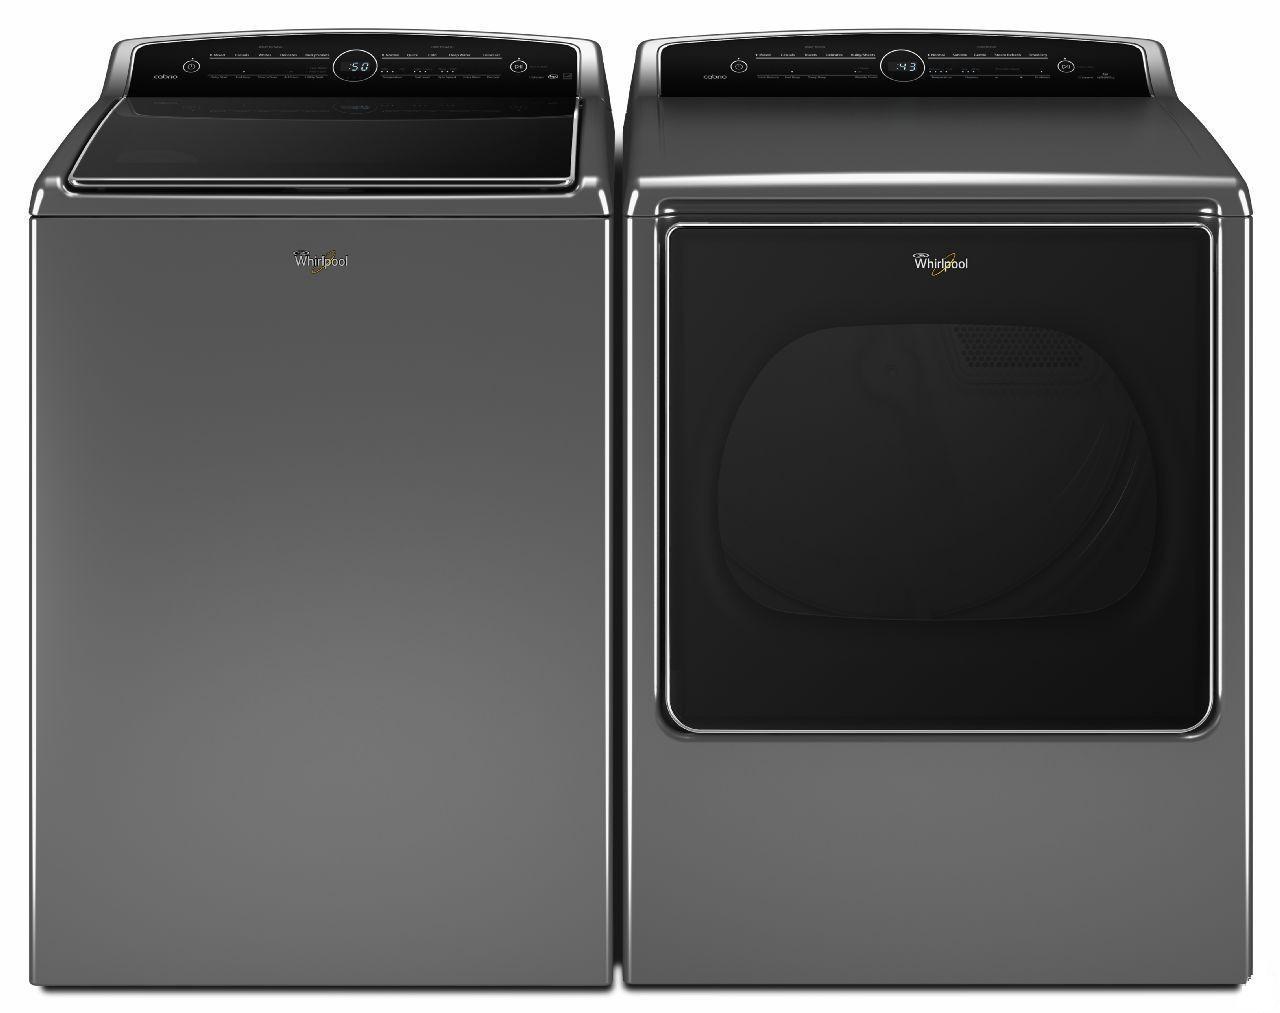 Wgd8500d Whirlpool Wgd8500d Cabrio Gas Dryers